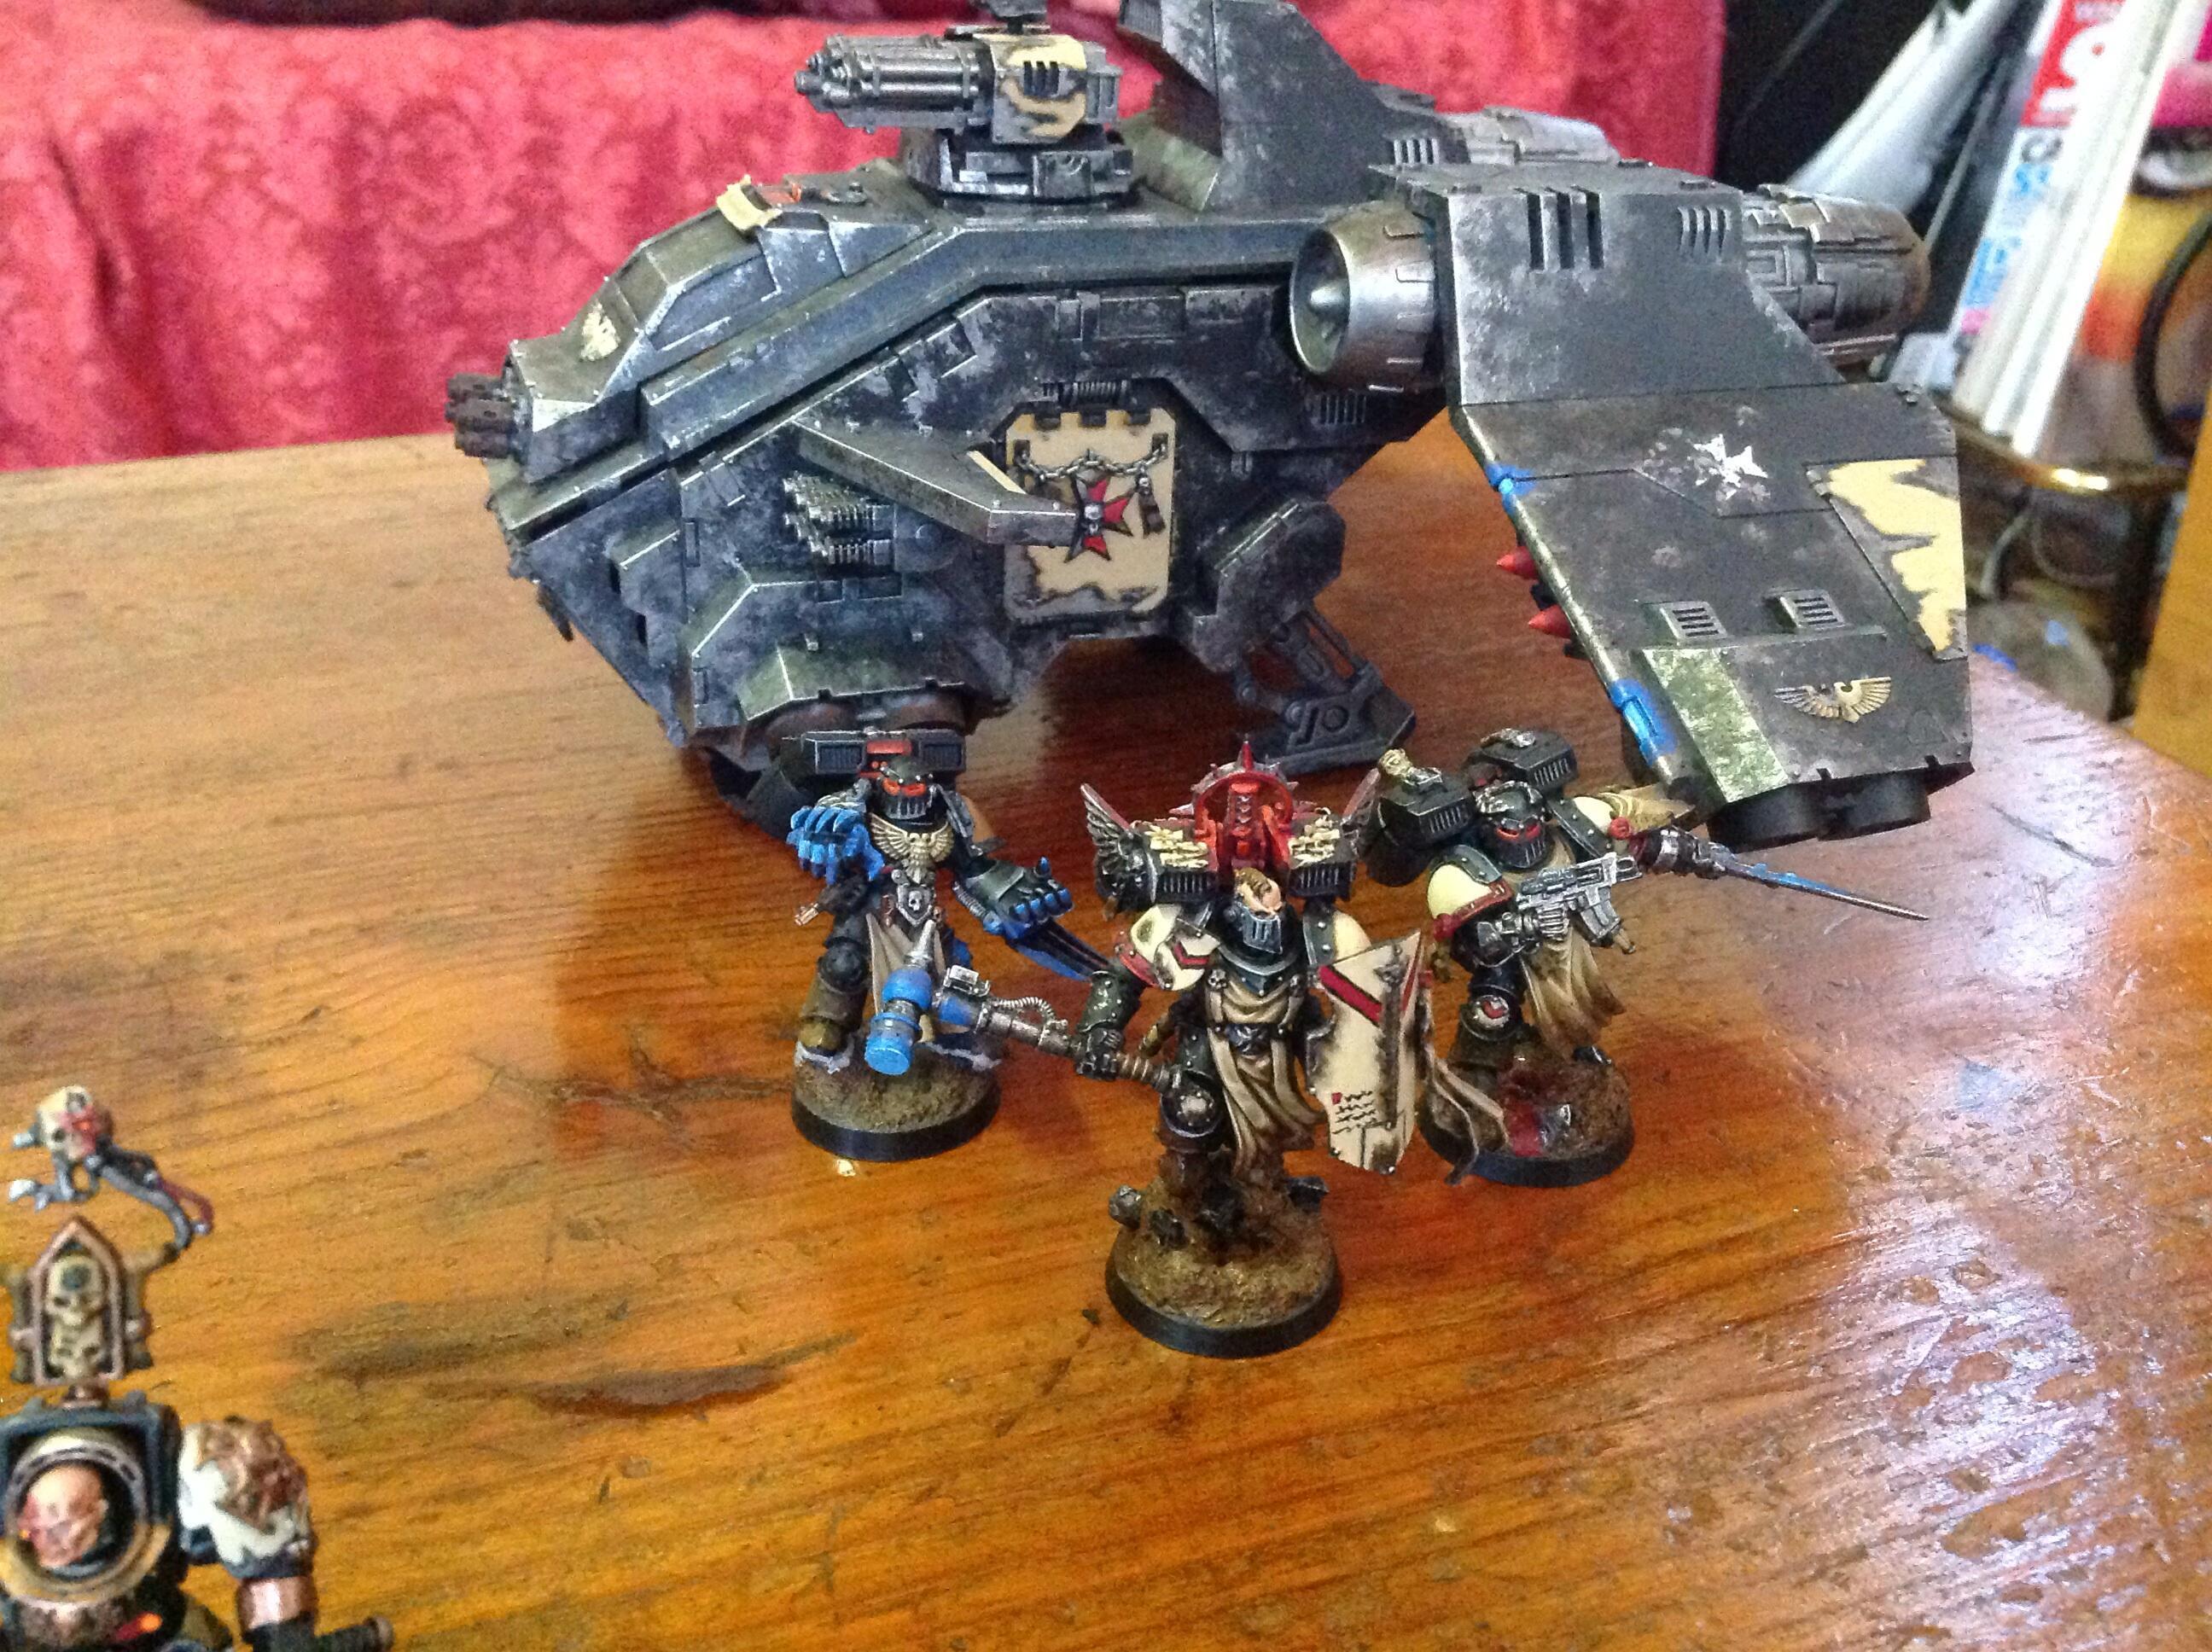 Army, Black Templars, Dreadnought, Space Marines, Storm Raven, Stormraven, Vanguard, Warhammer 40,000